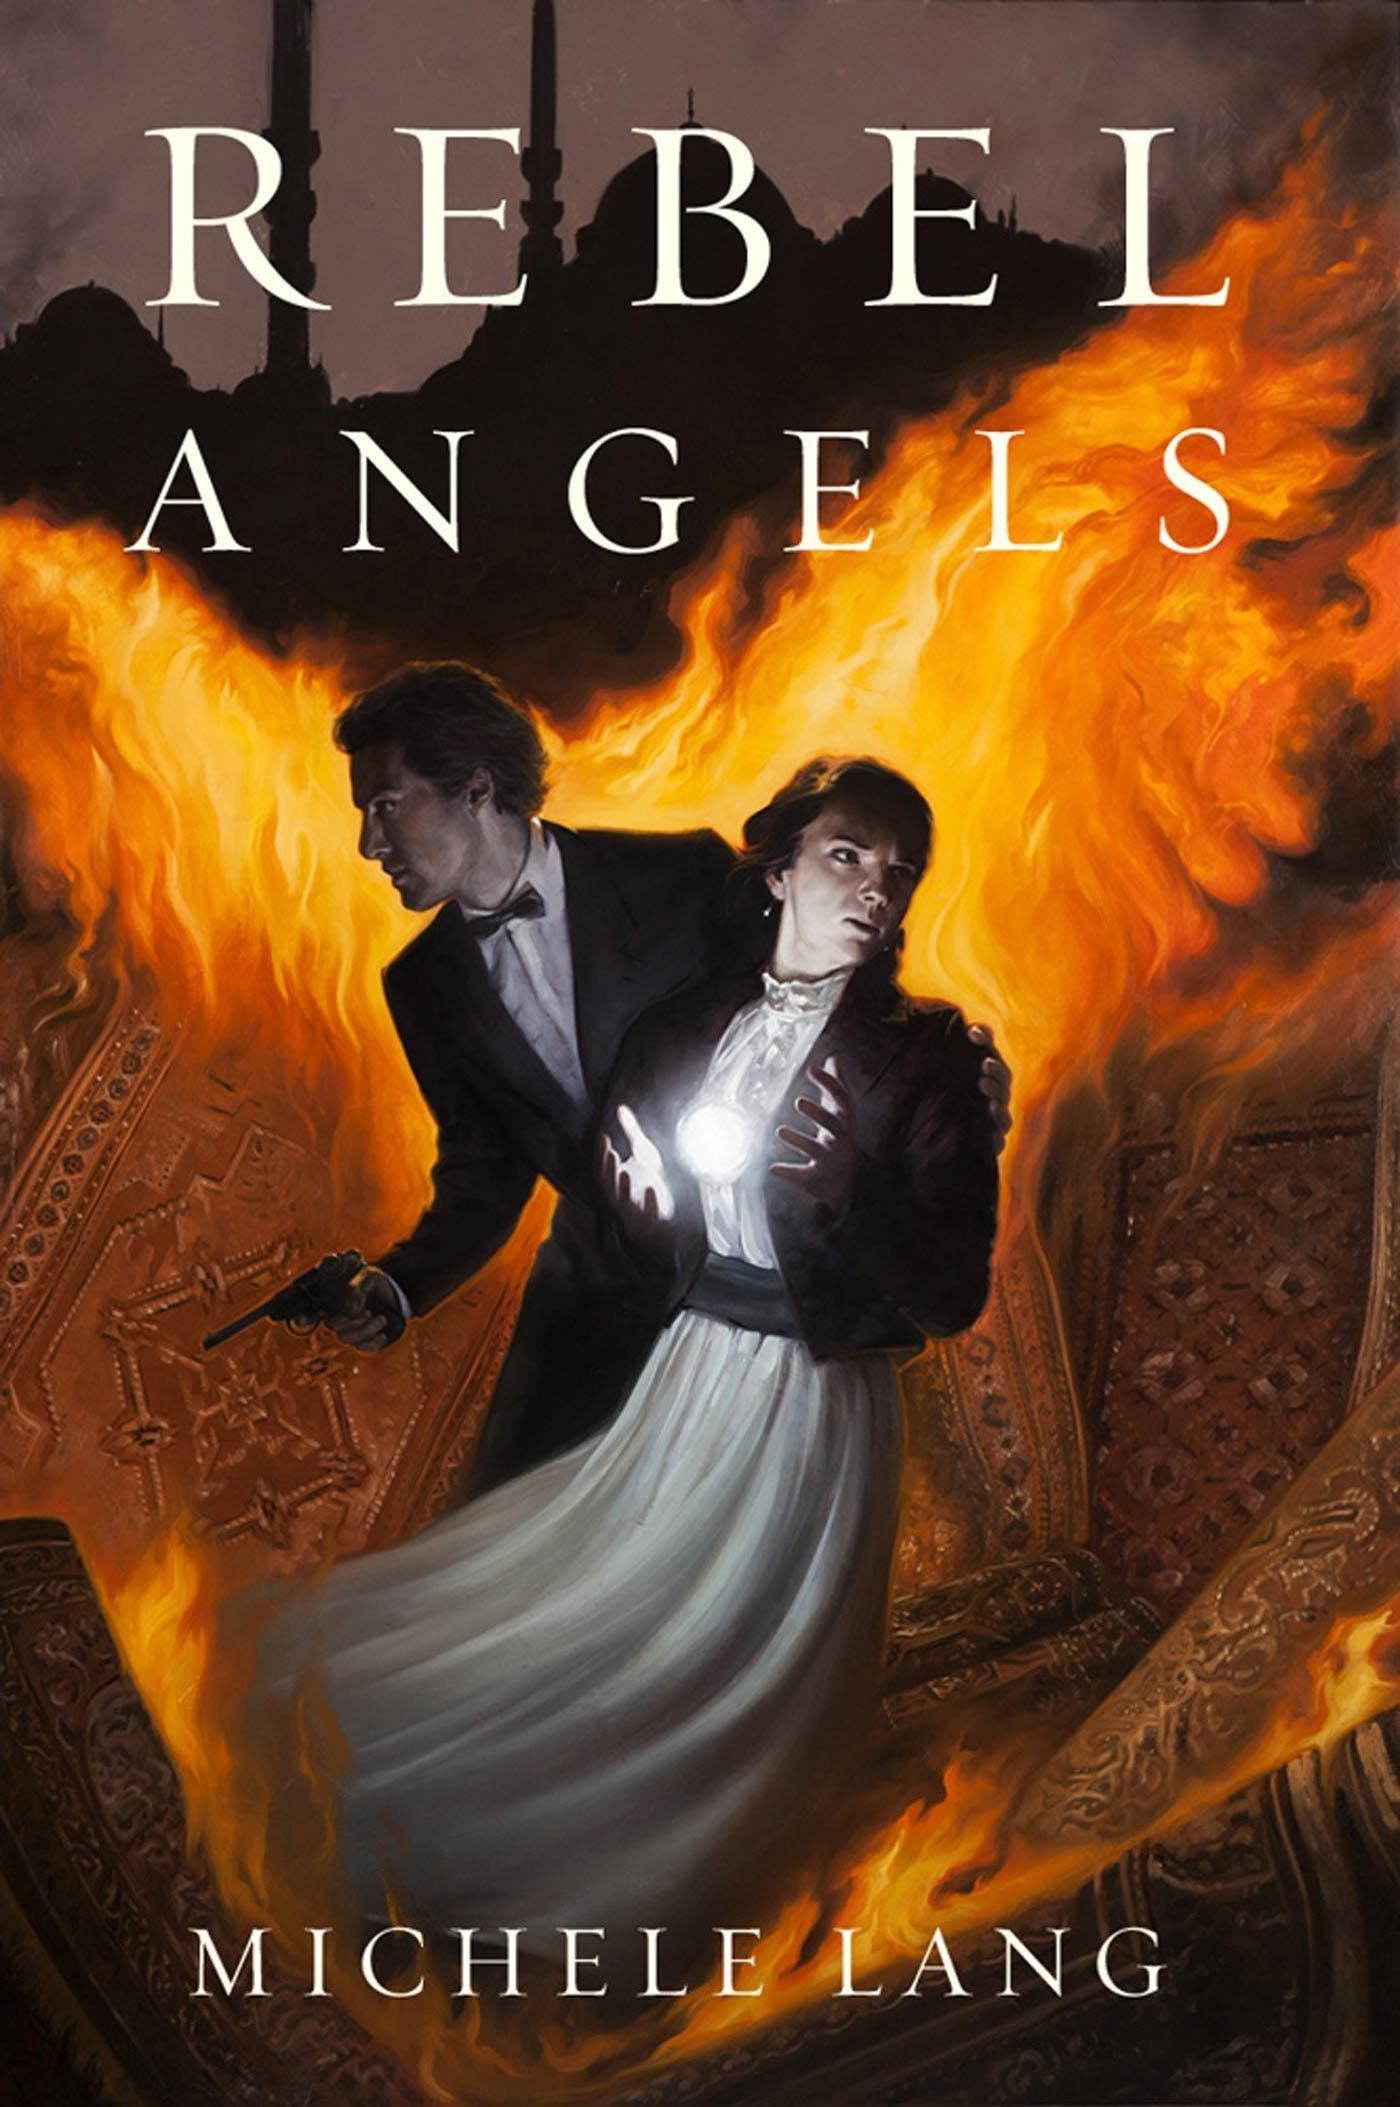 Image of Rebel Angels